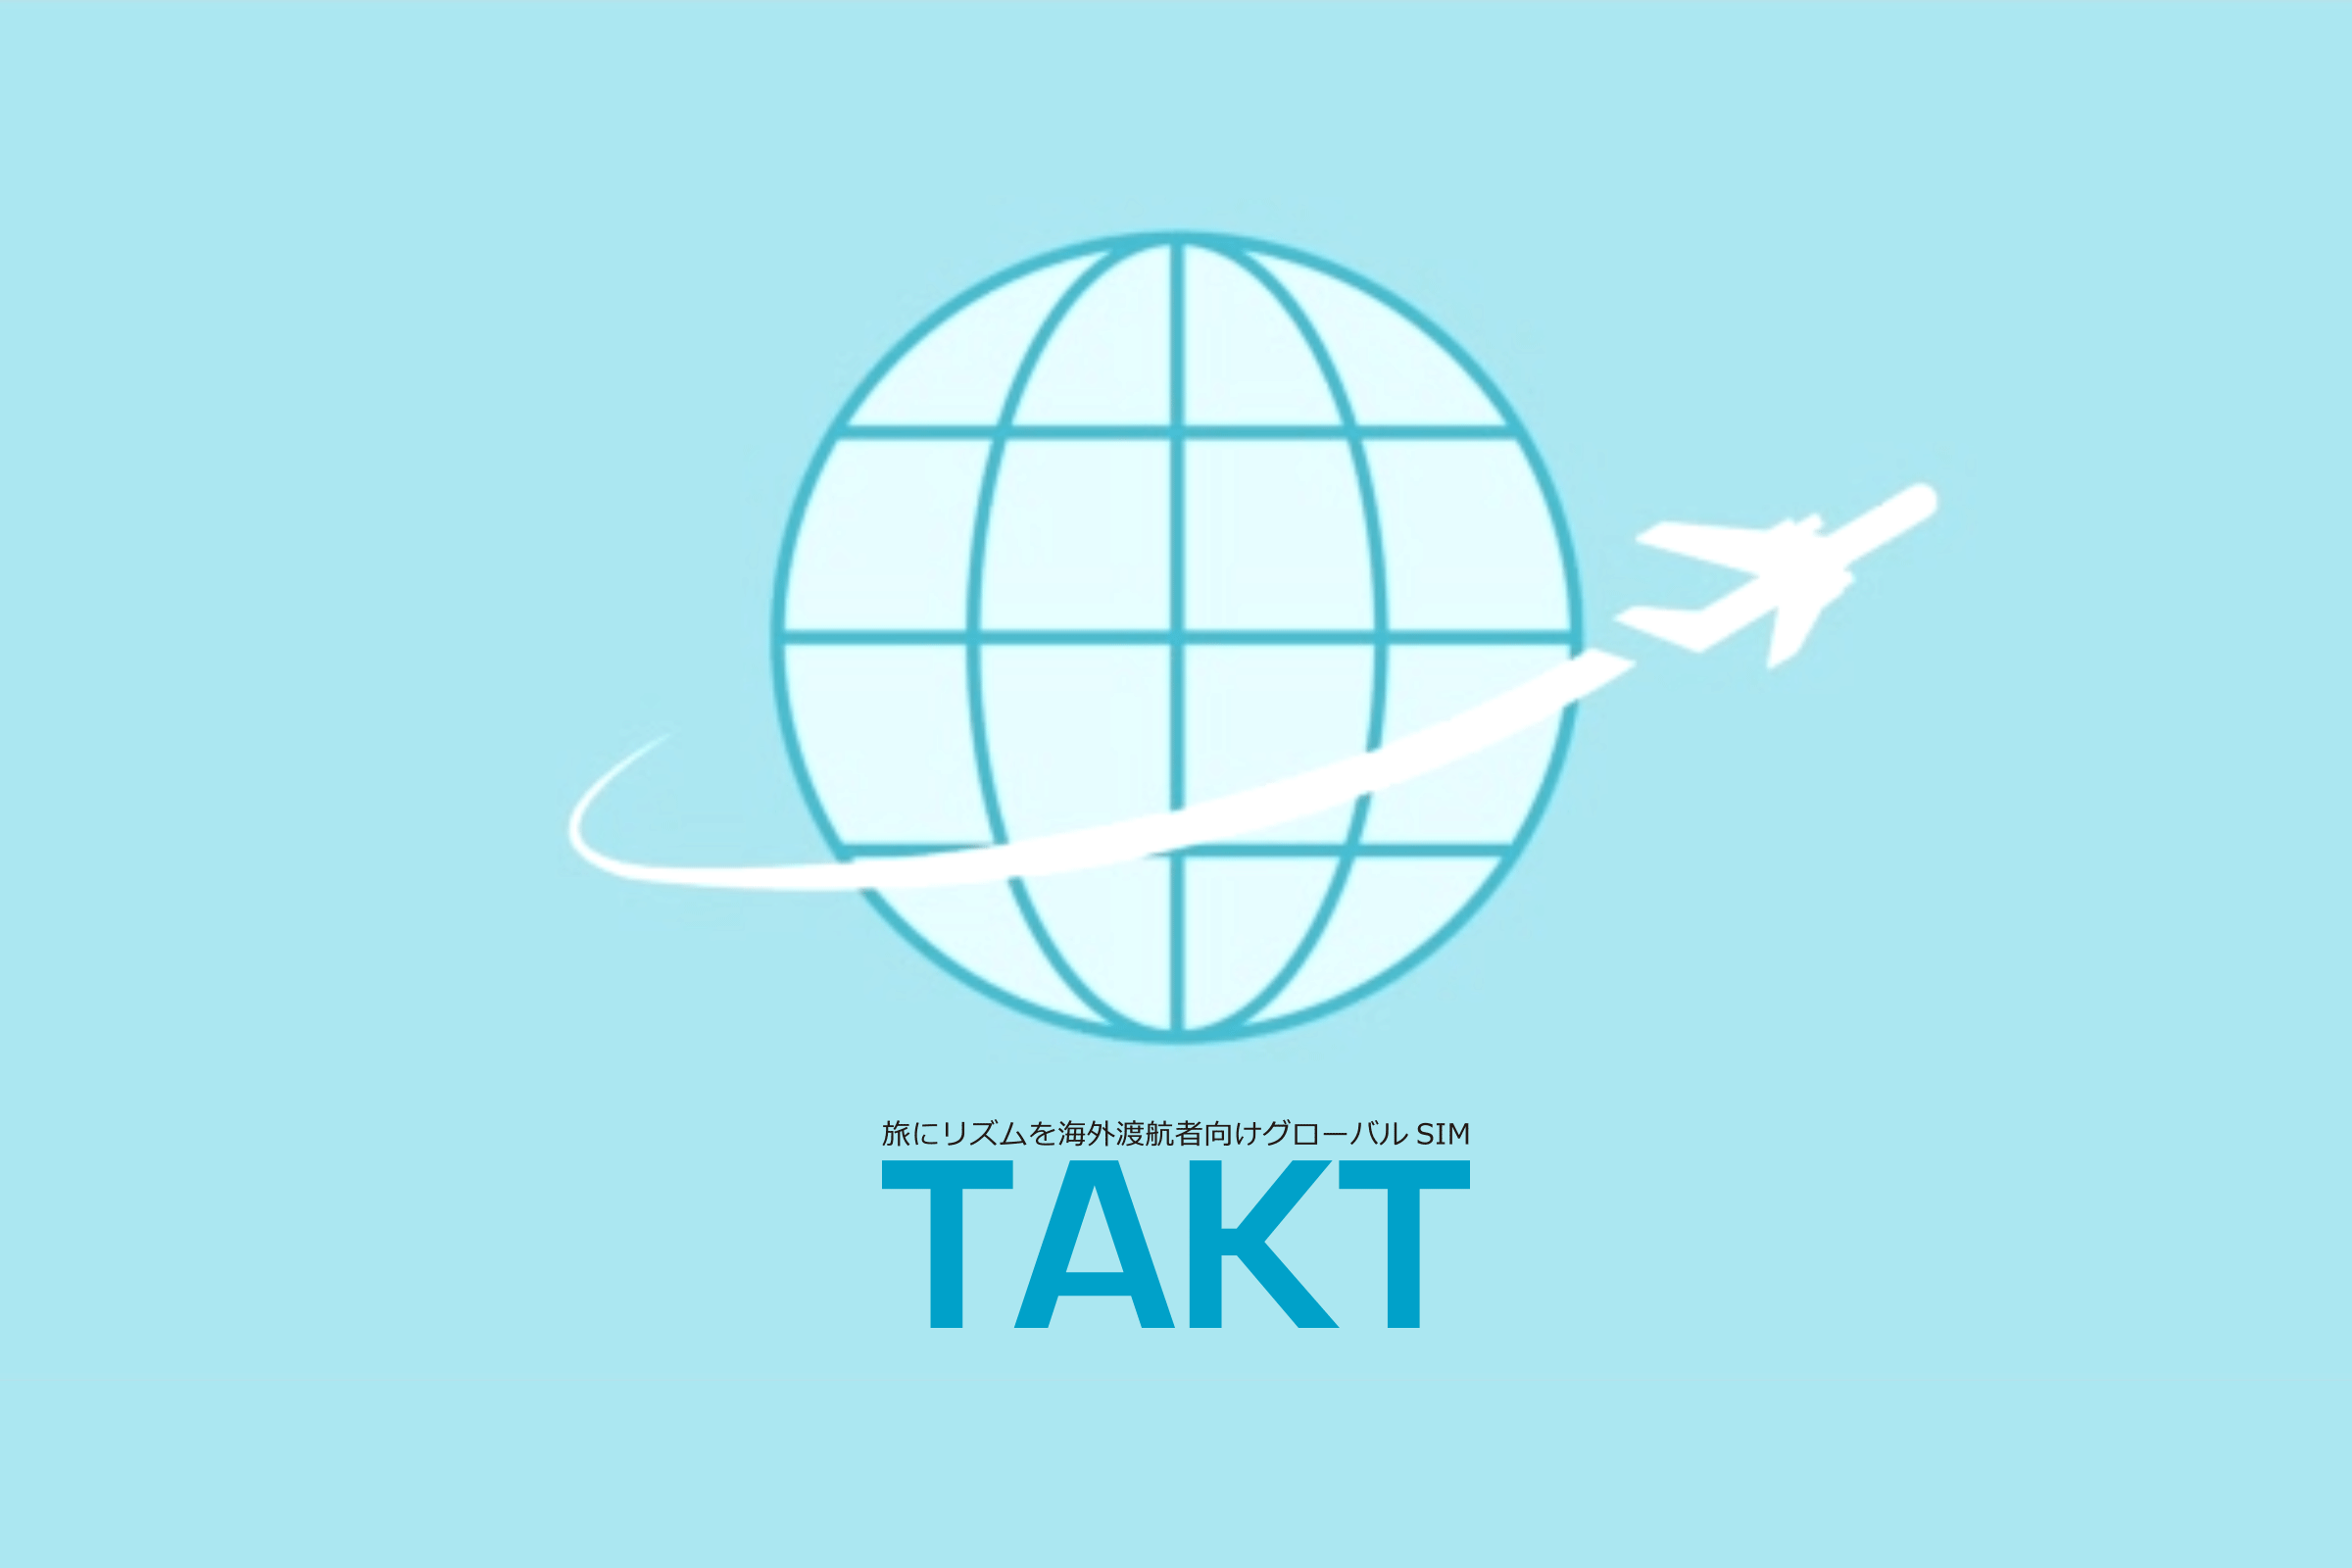 Planetway、世界約200カ国で利用可能なグローバルSIMカード 「TAKT」の提供を開始